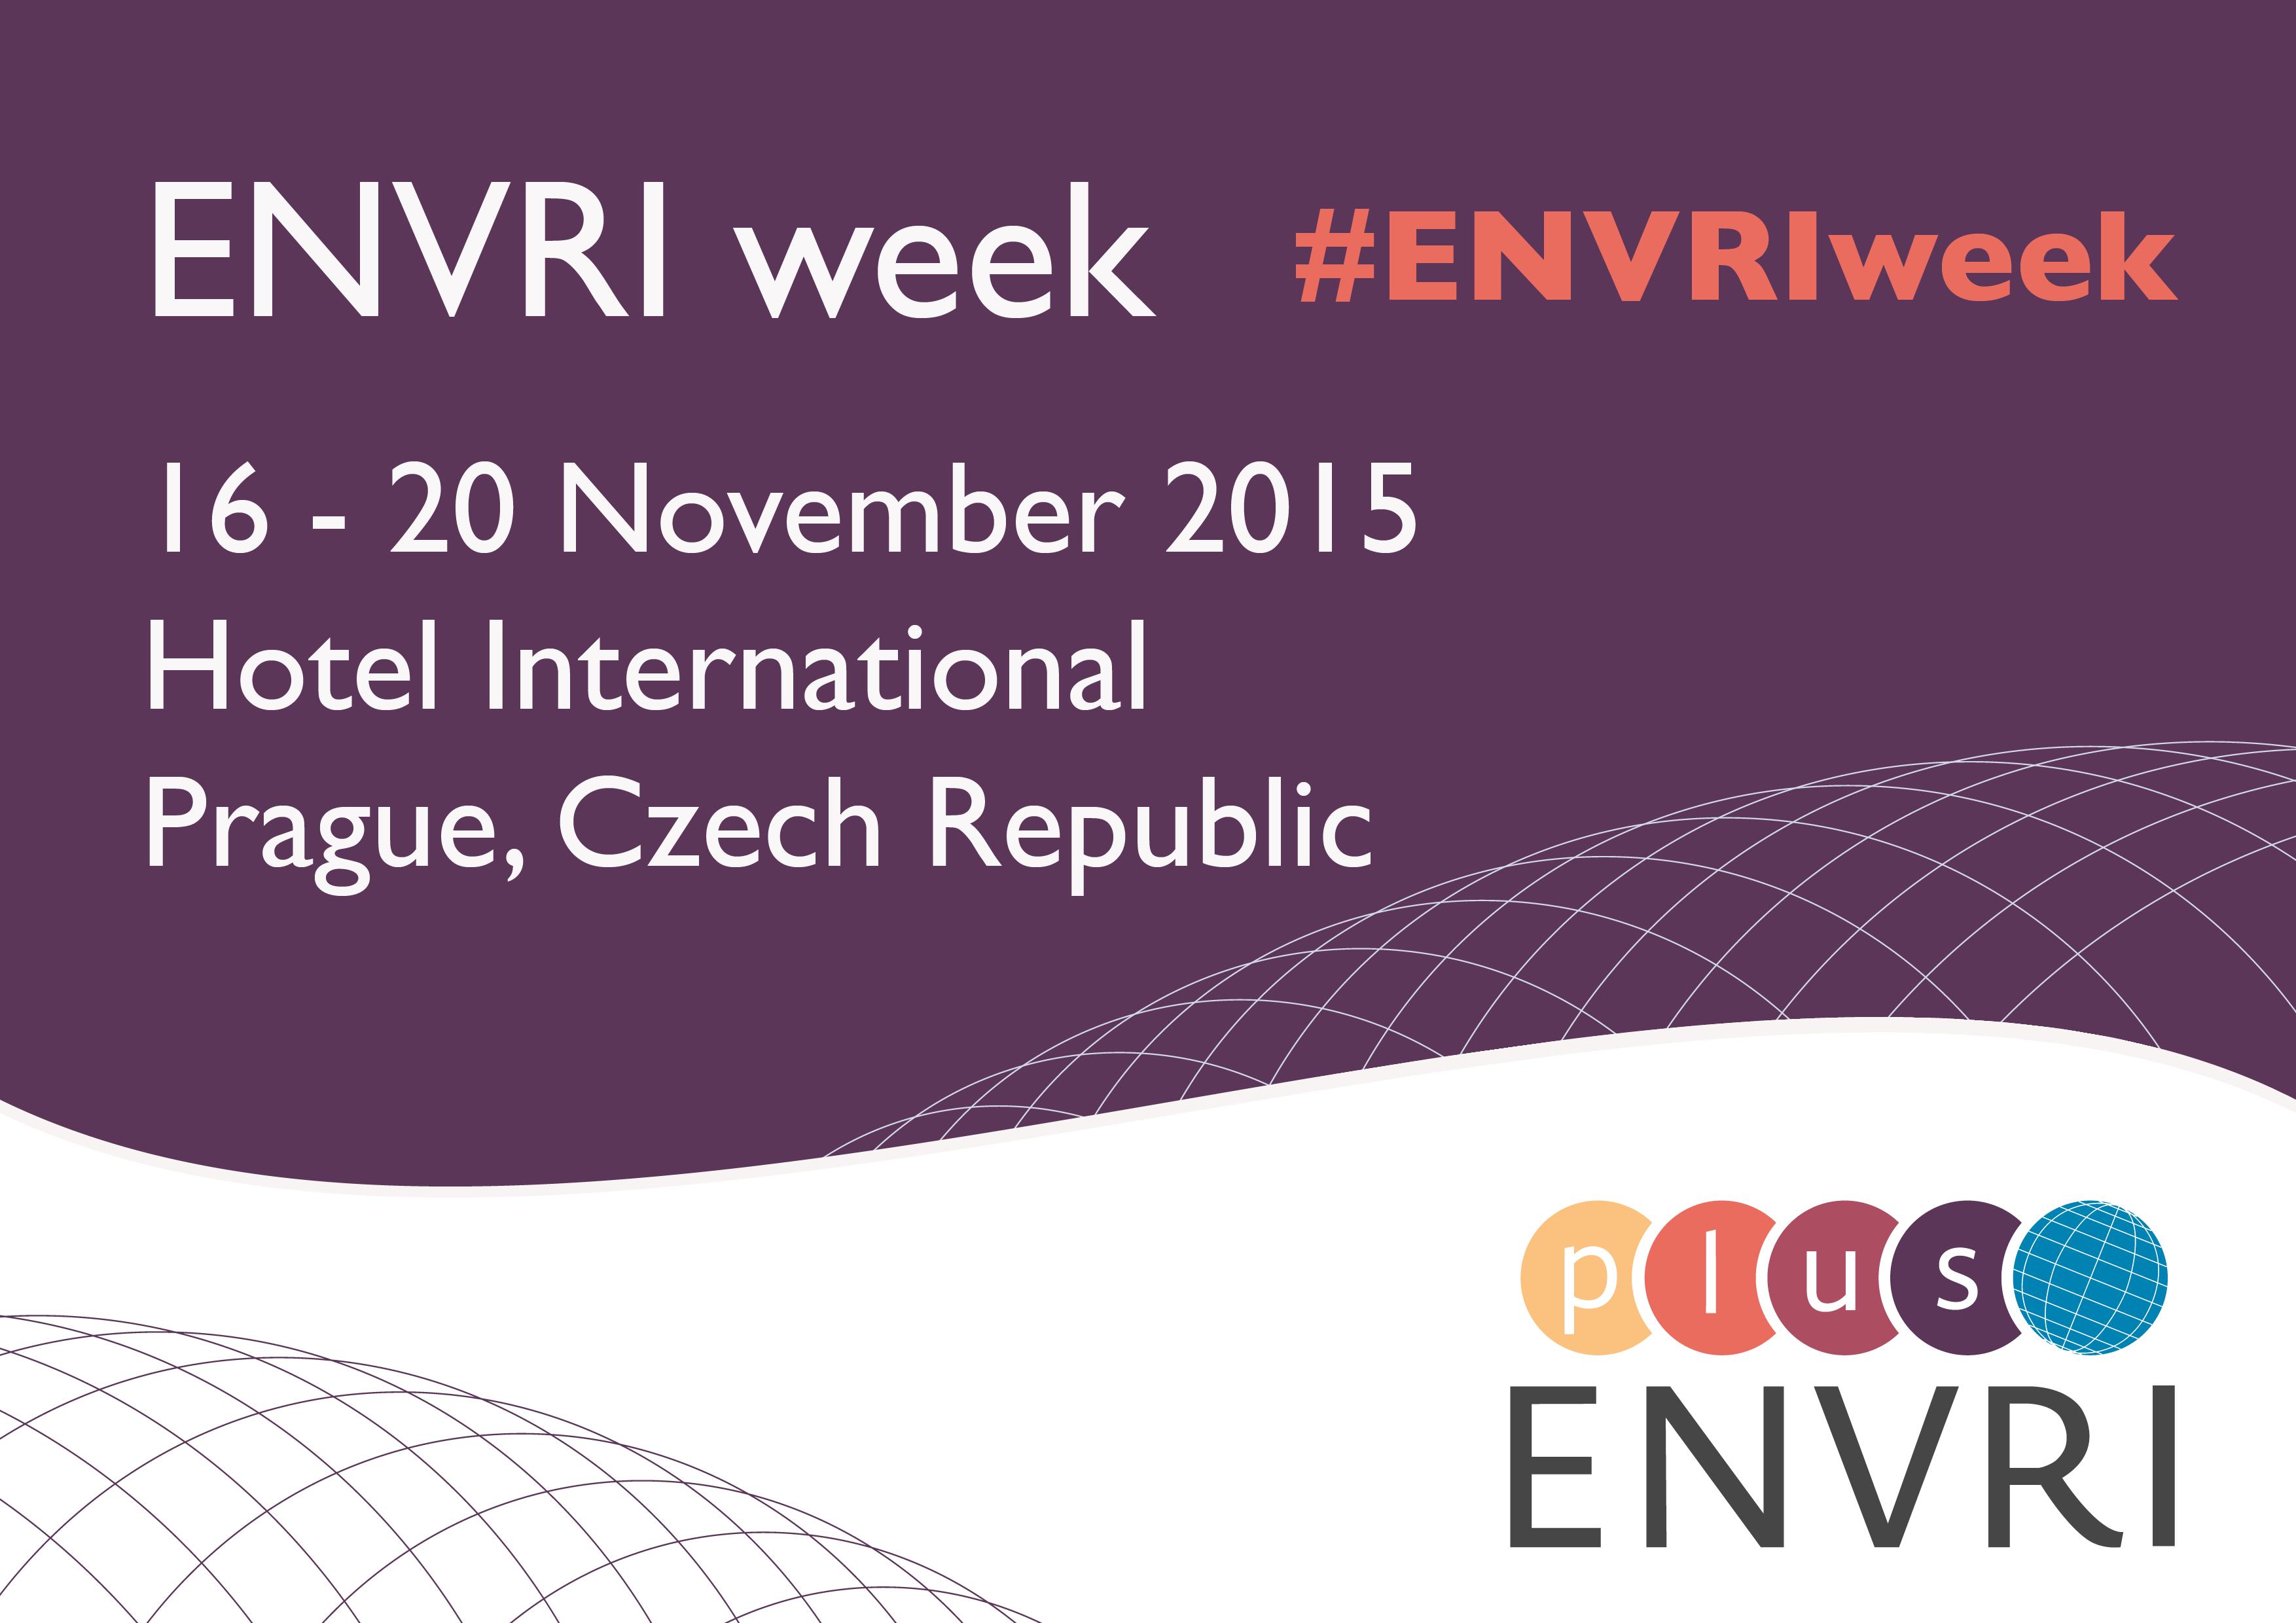 ENVRI week invitation#